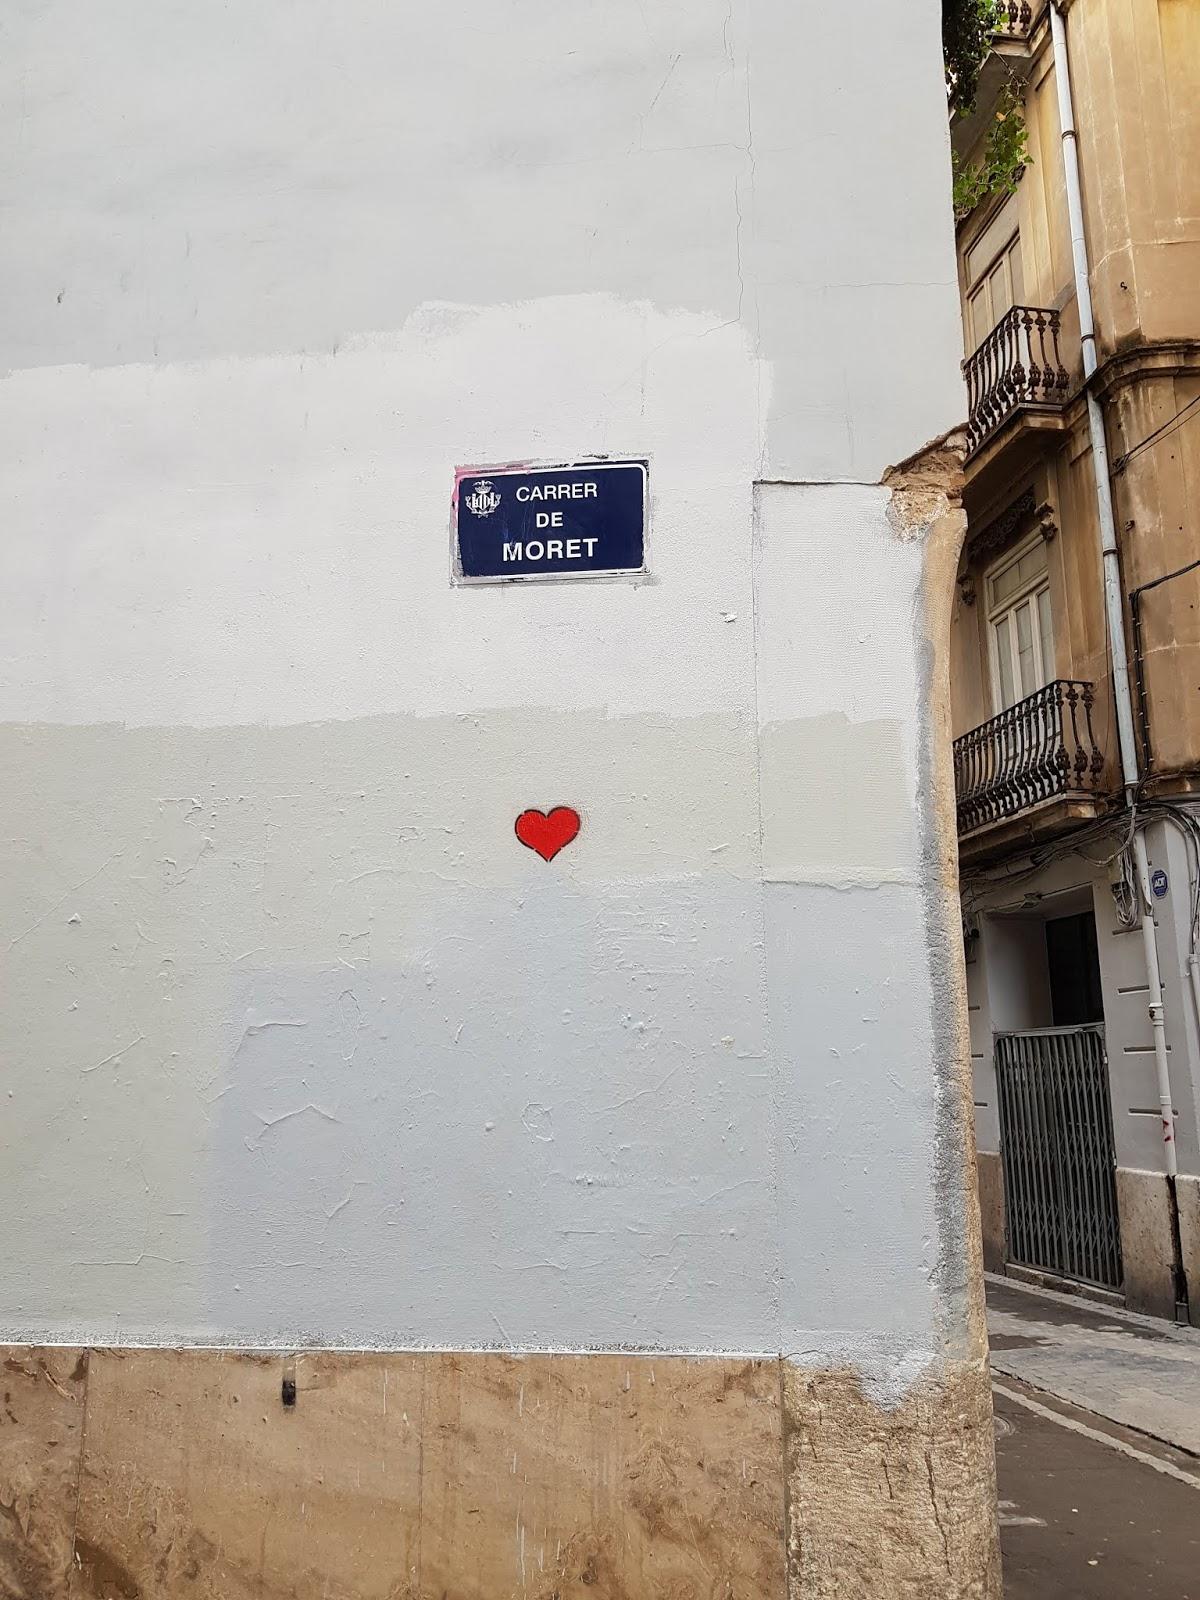 Ulica Moret w Walencji - sztuka, kolory i pocałunki